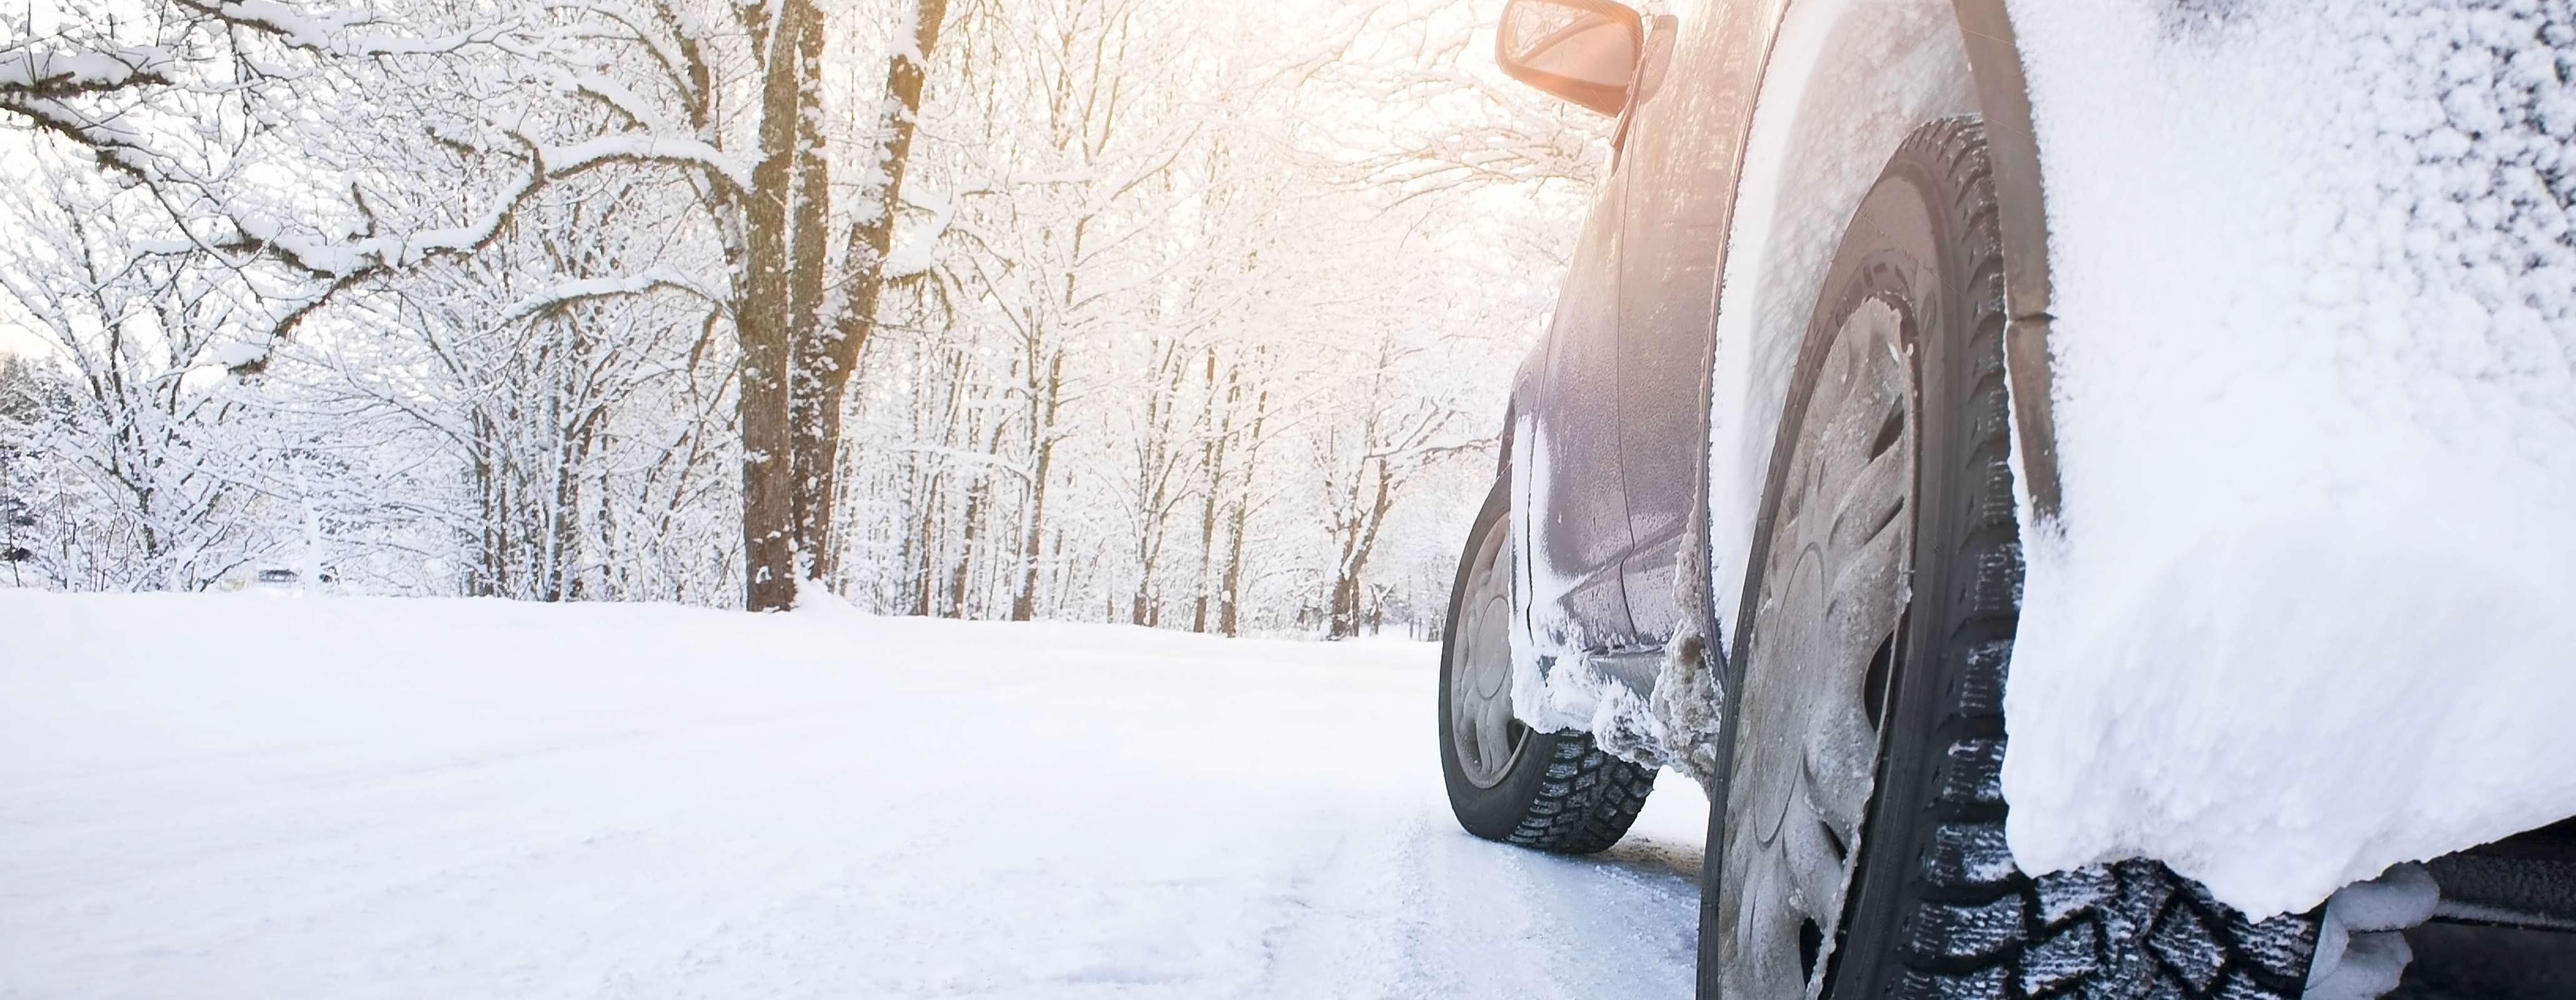 Auto op besneeuwde weg